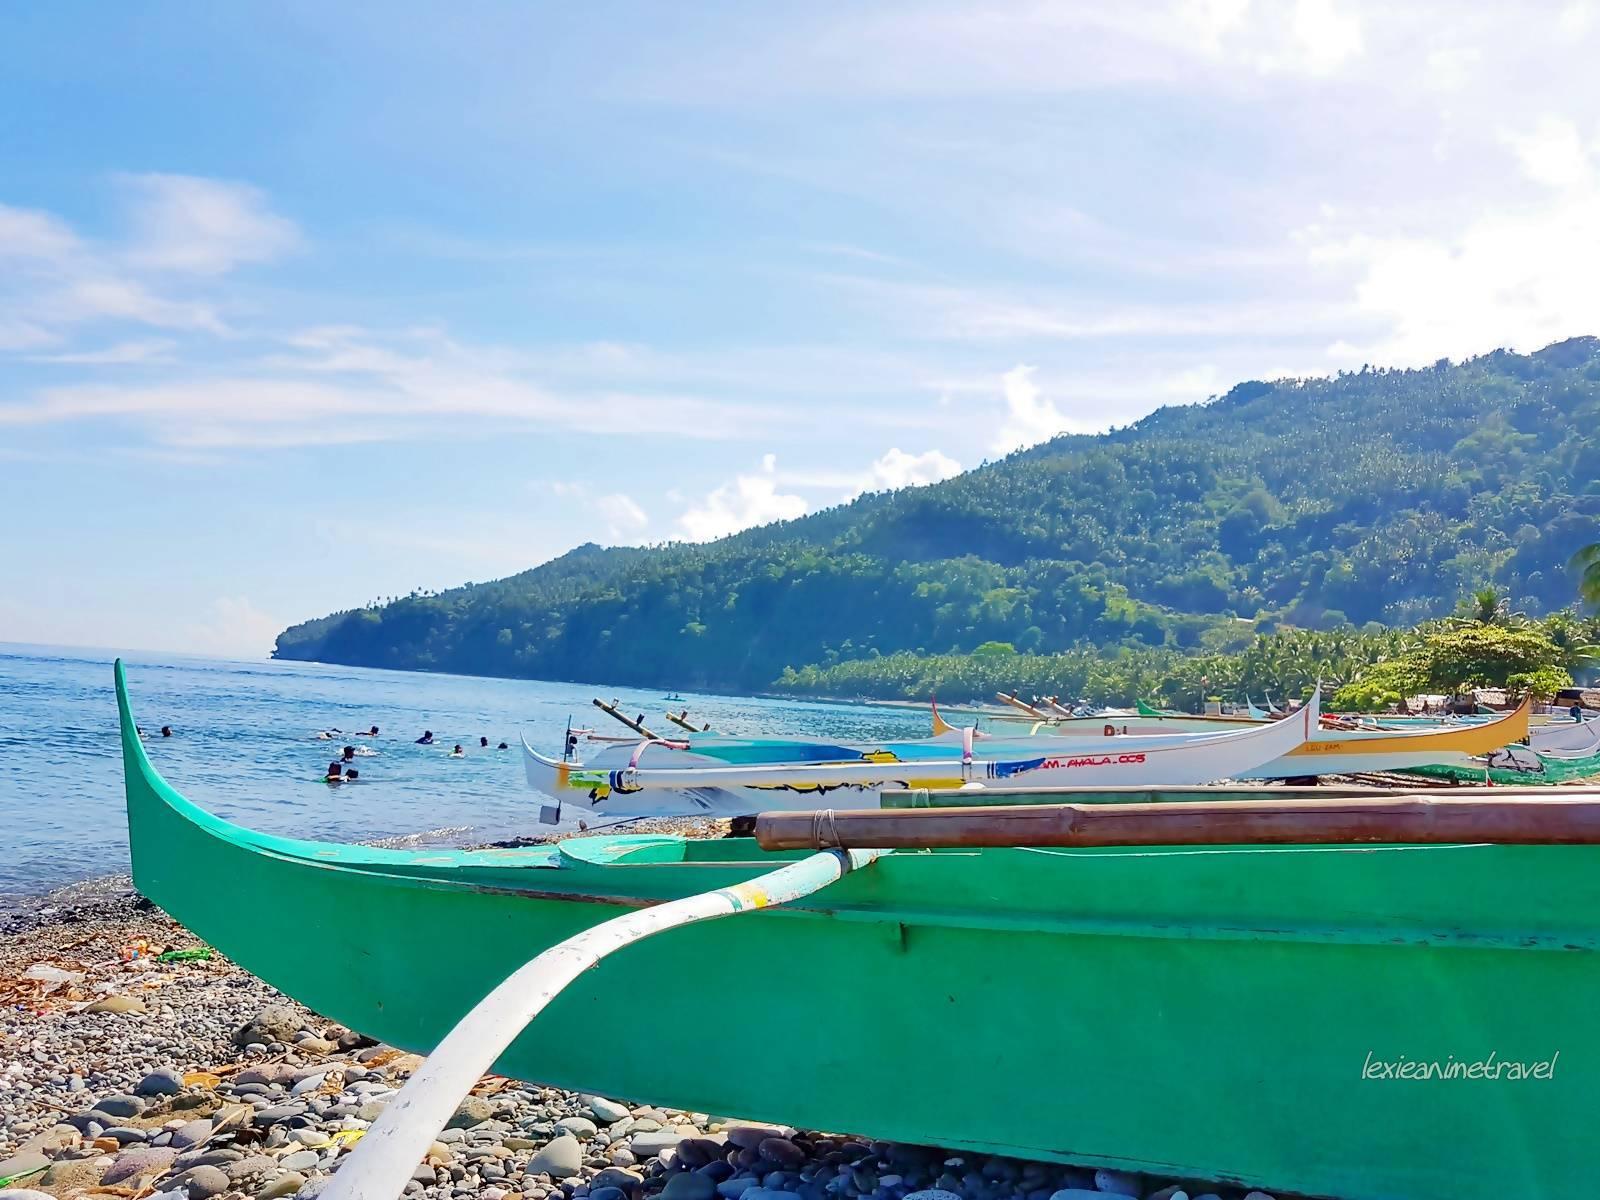 Viaje a mi Cuidad Zamboanga, Philippines - LexieAnimeTravel